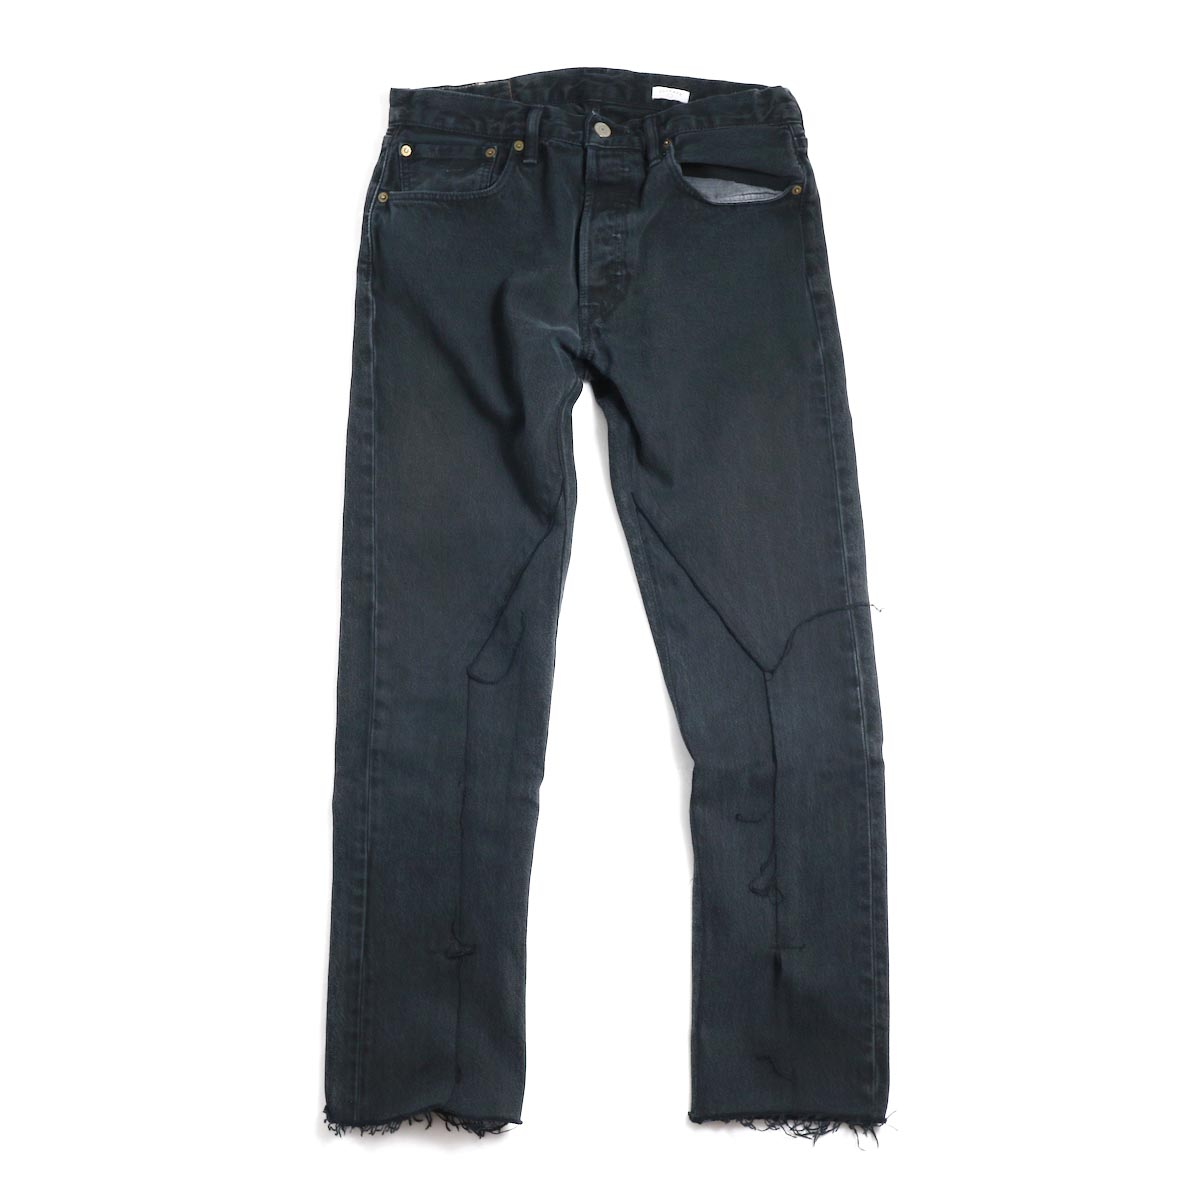 OLD PARK / Slit Jeans -Black Msize(B)